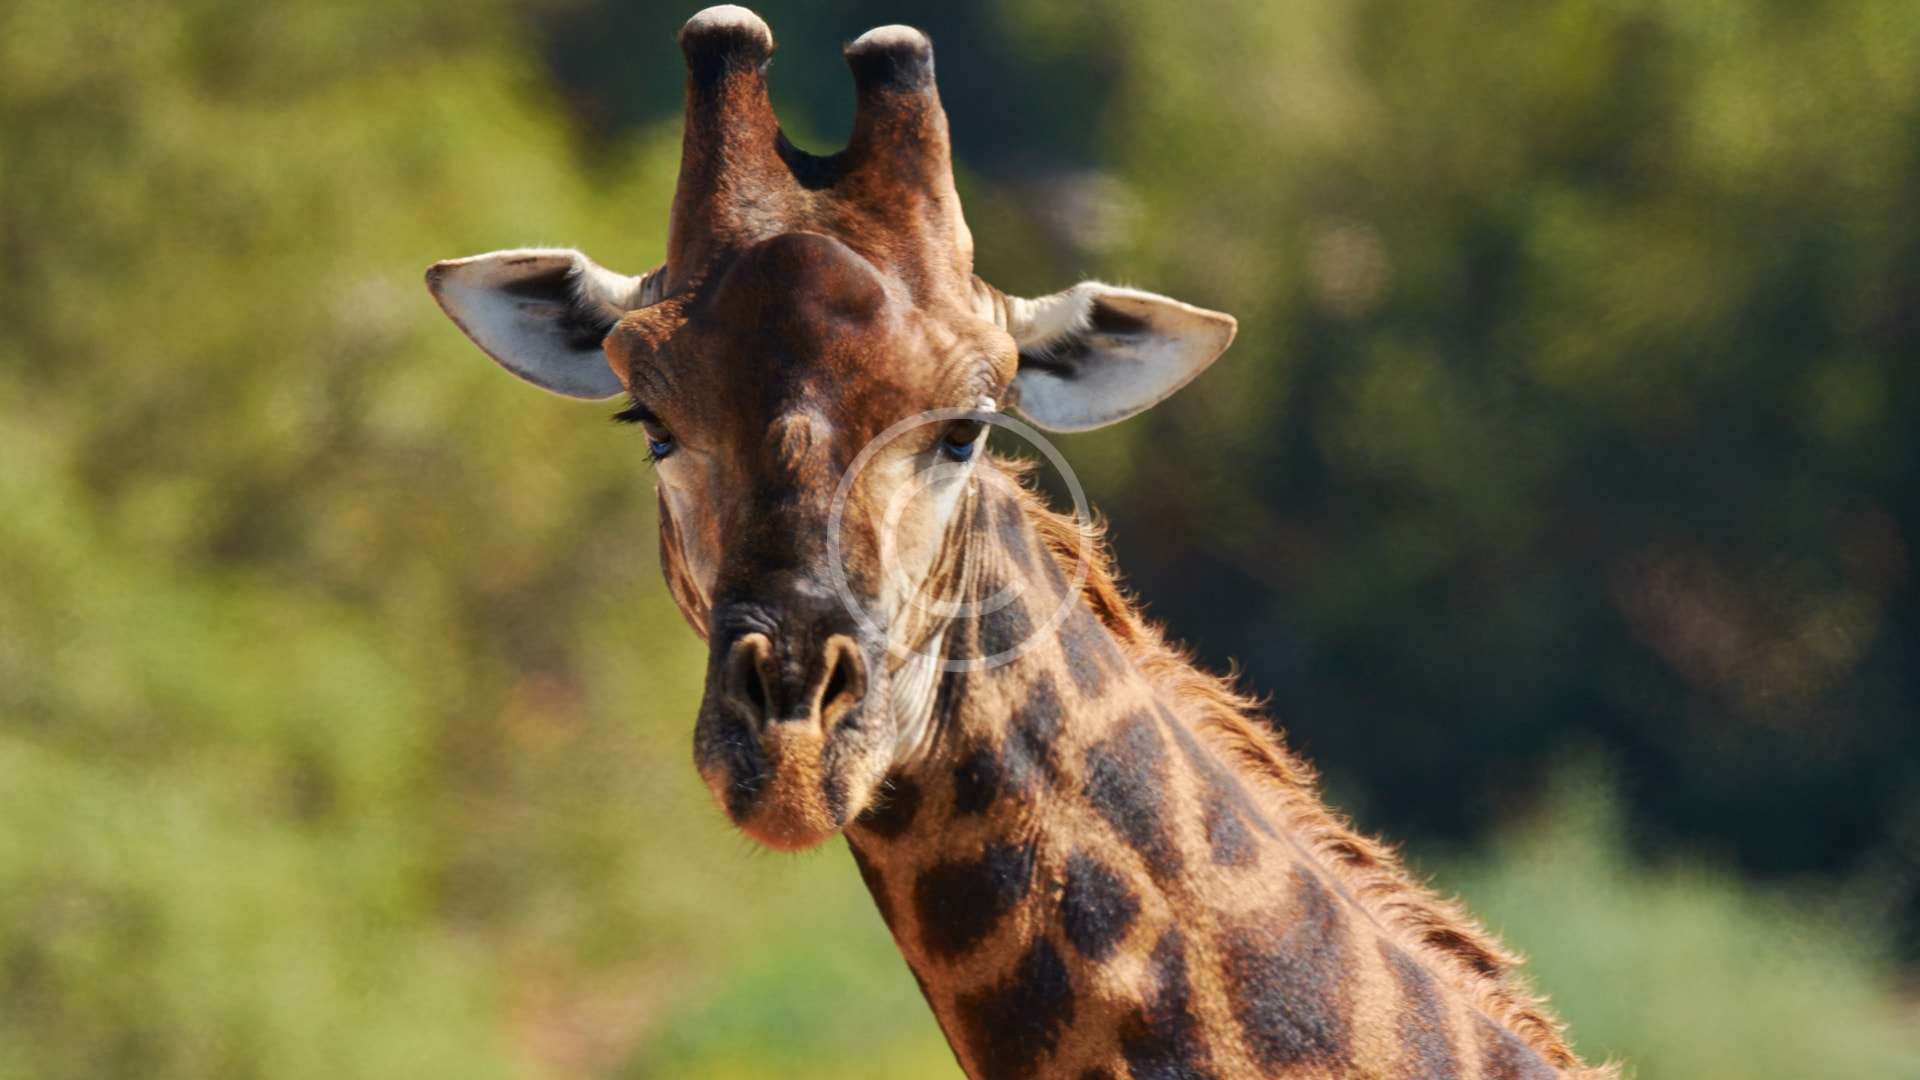 Donate to Giraffe Conservation